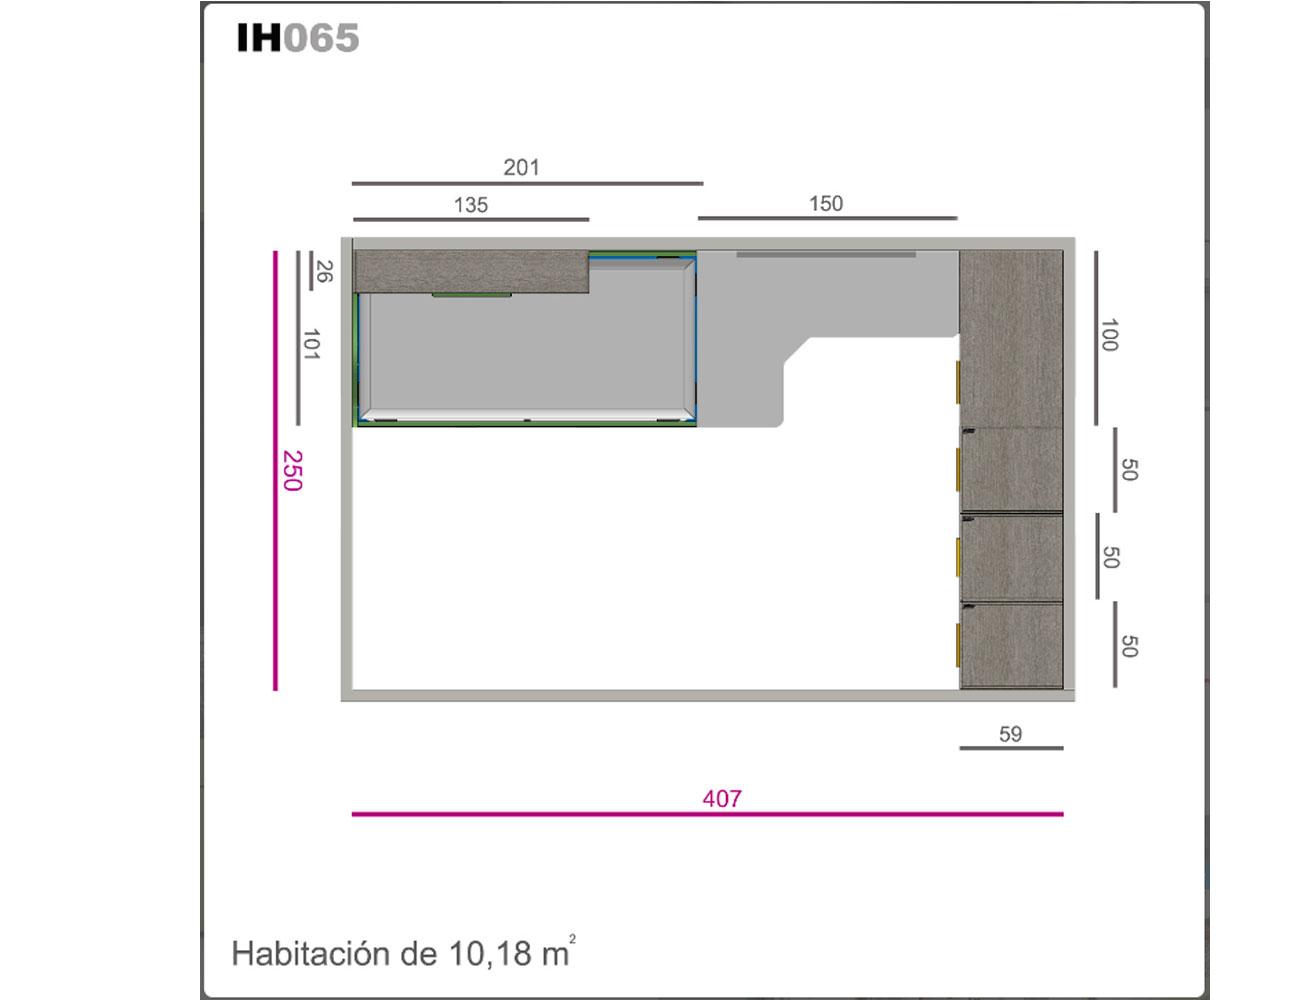 Ih065 medidas